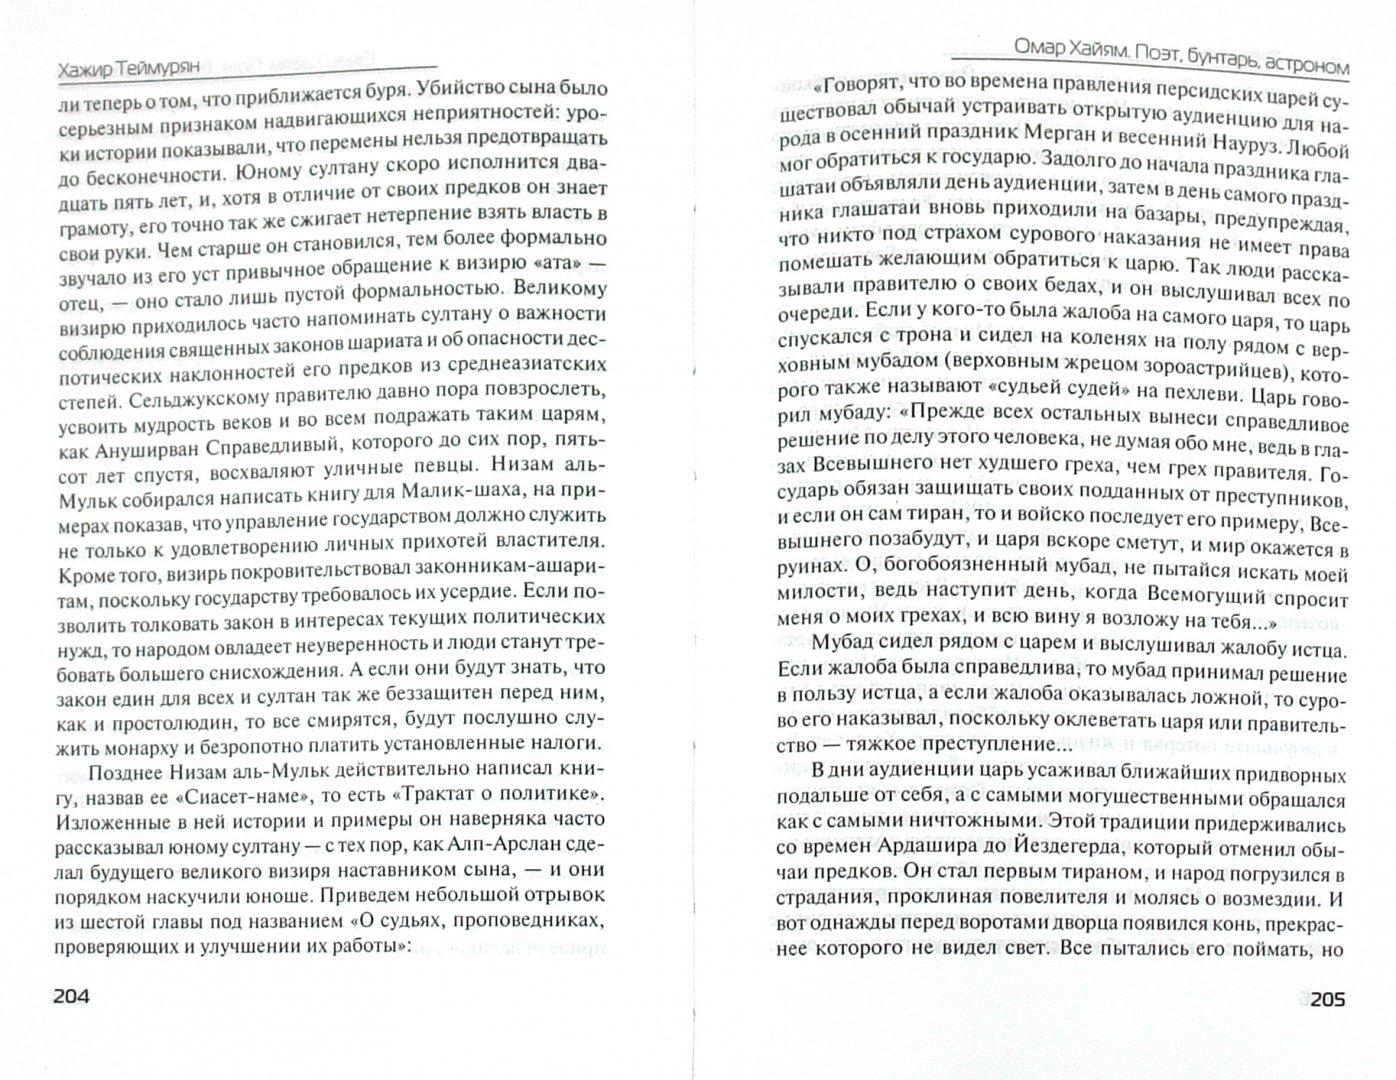 Иллюстрация 1 из 6 для Омар Хайям. Поэт, бунтарь, астроном - Хажир Теймурян   Лабиринт - книги. Источник: Лабиринт